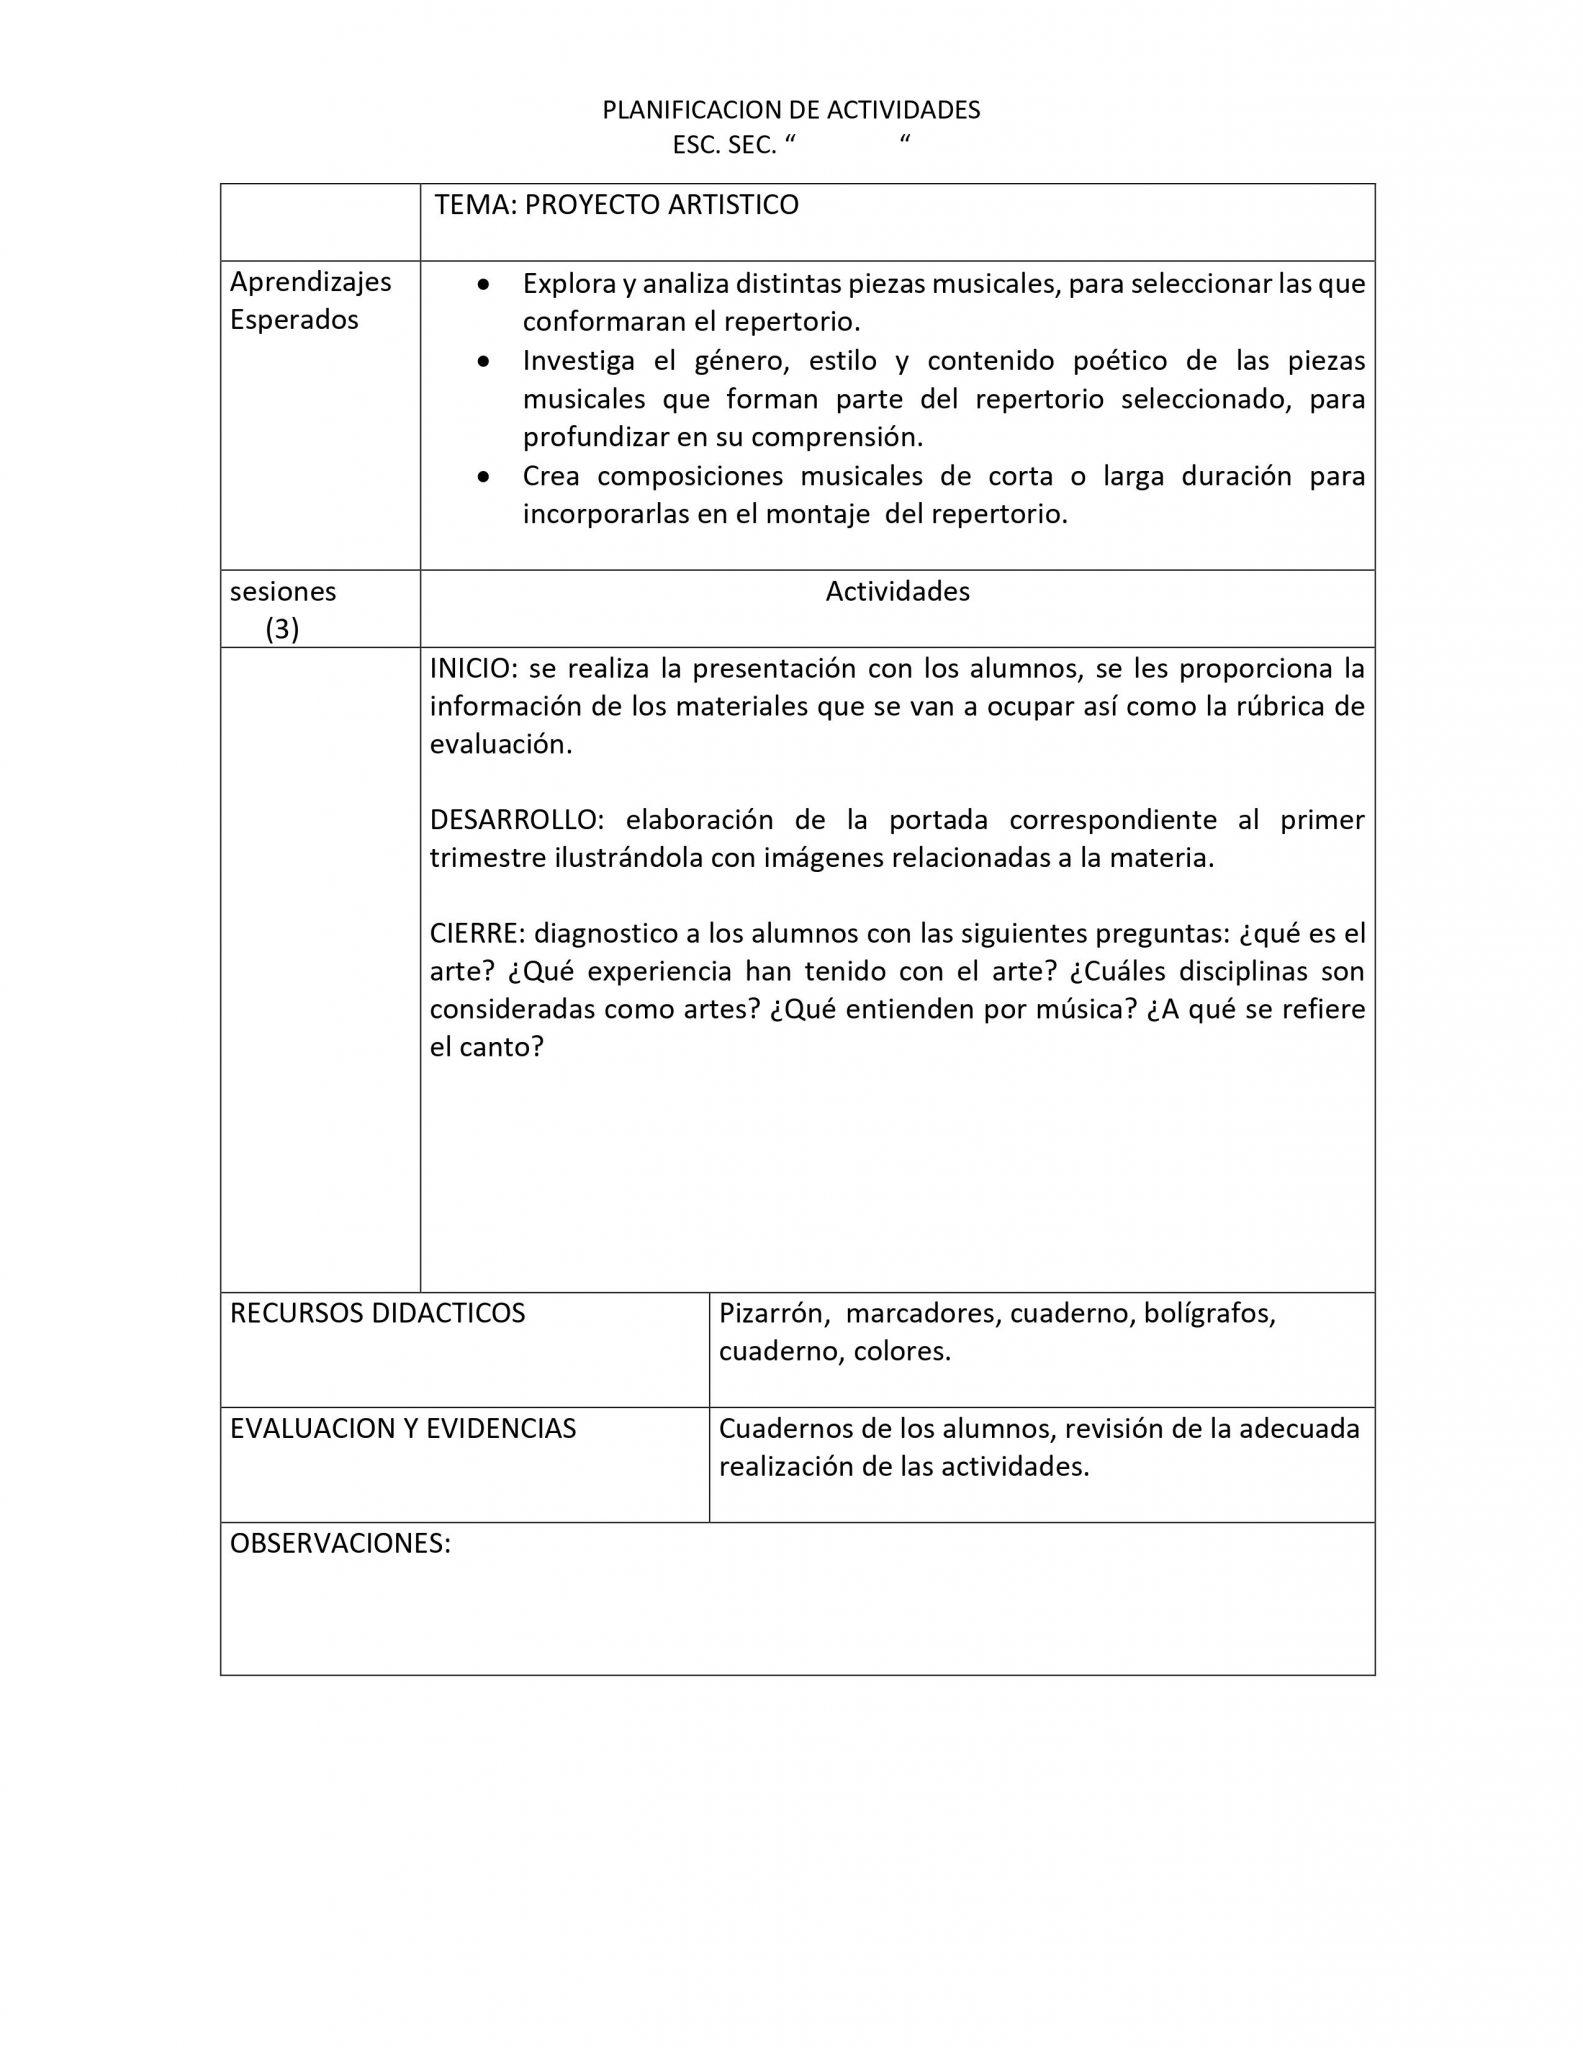 Planeaciones Artes Música 3 Secundaria (Nuevo Modelo Educativo) 1er. Trimestre 02